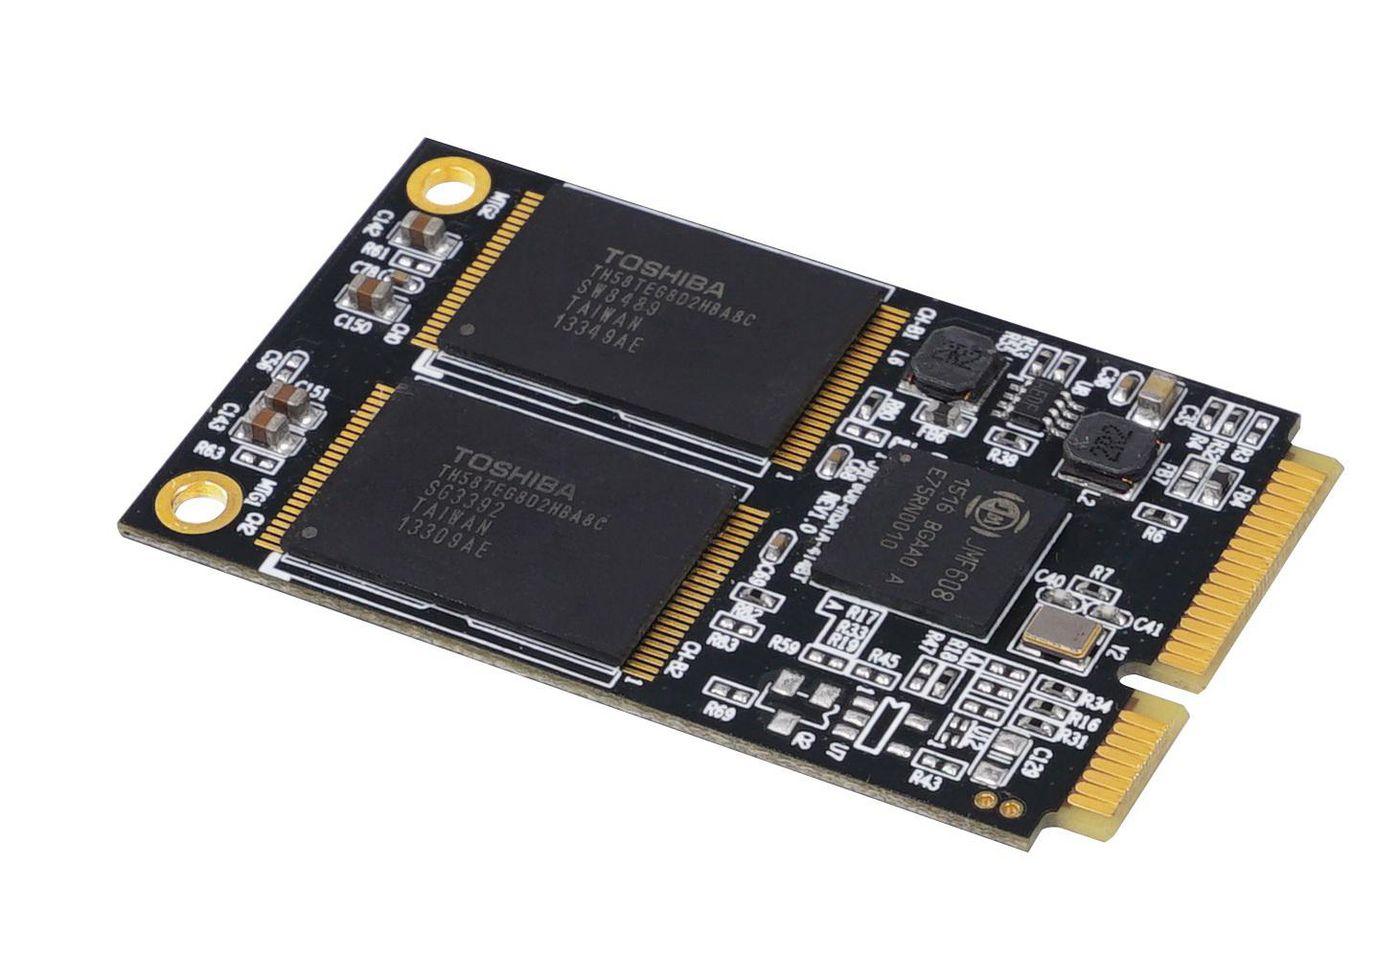 CoreParts MSACSC4M256MSA mSATA 256GB MLC SSD SATA III